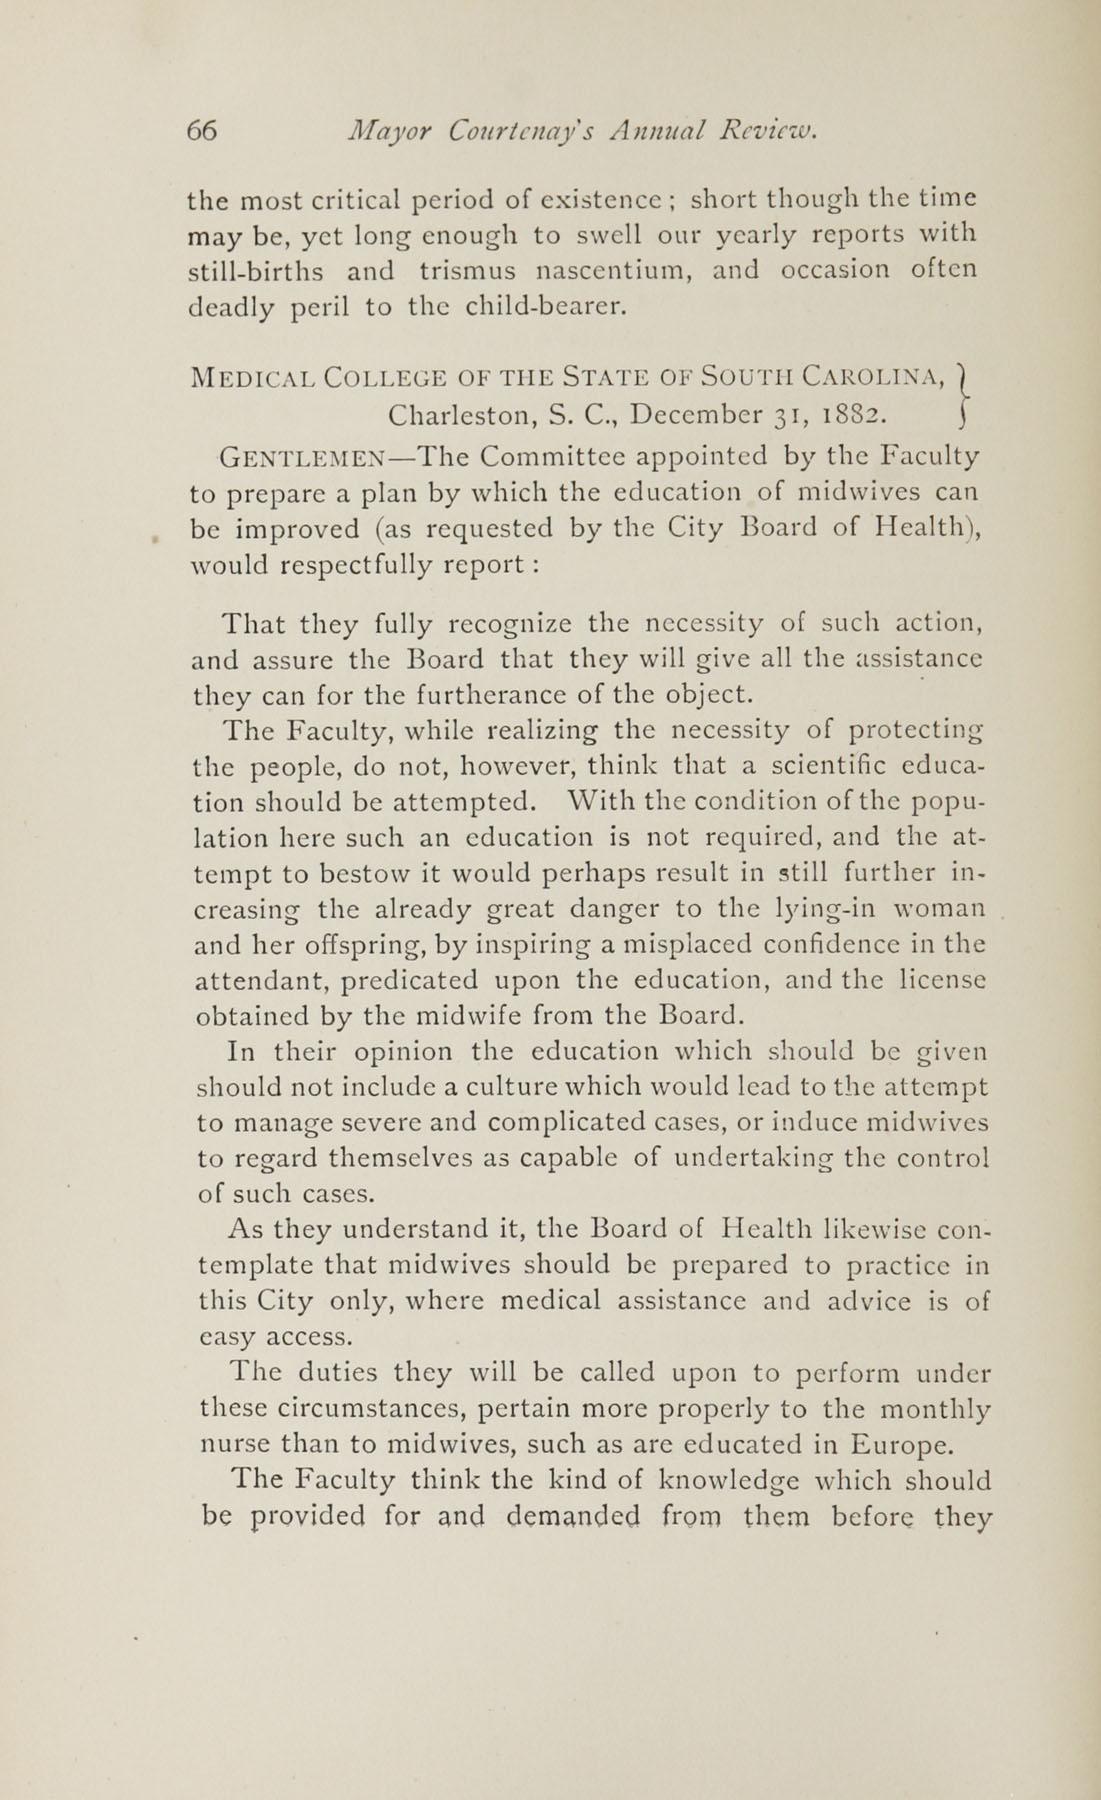 Charleston Yearbook, 1882, page 66